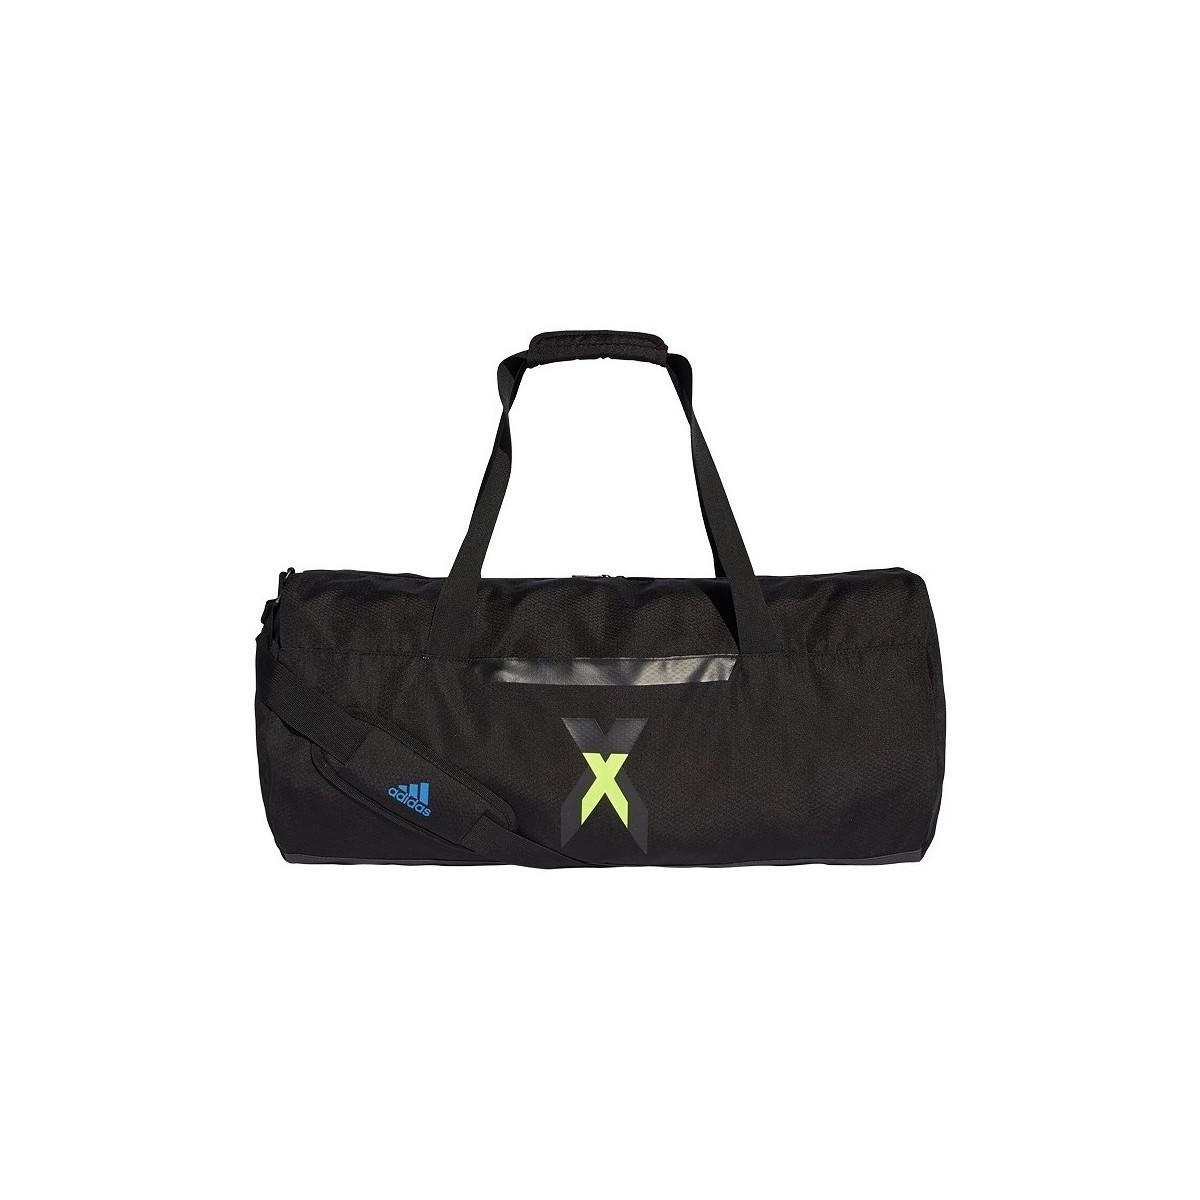 dad267e7f822 adidas Icon Duffel Men s Sports Bag In Black in Black for Men - Lyst